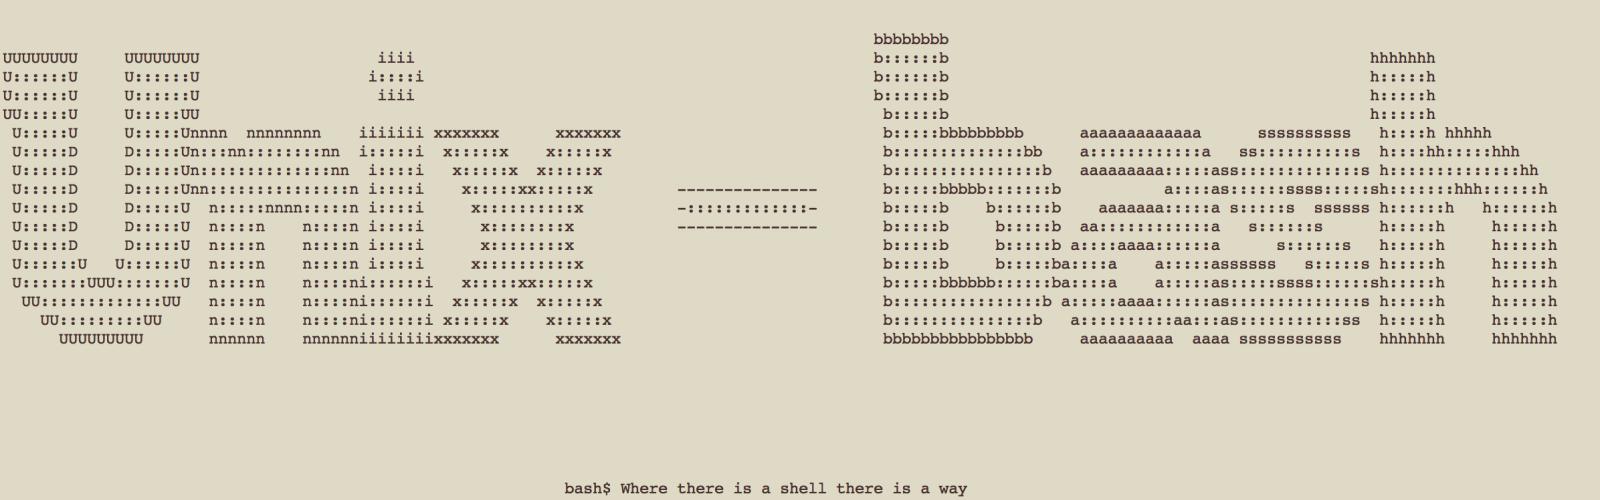 Unix-bash banner